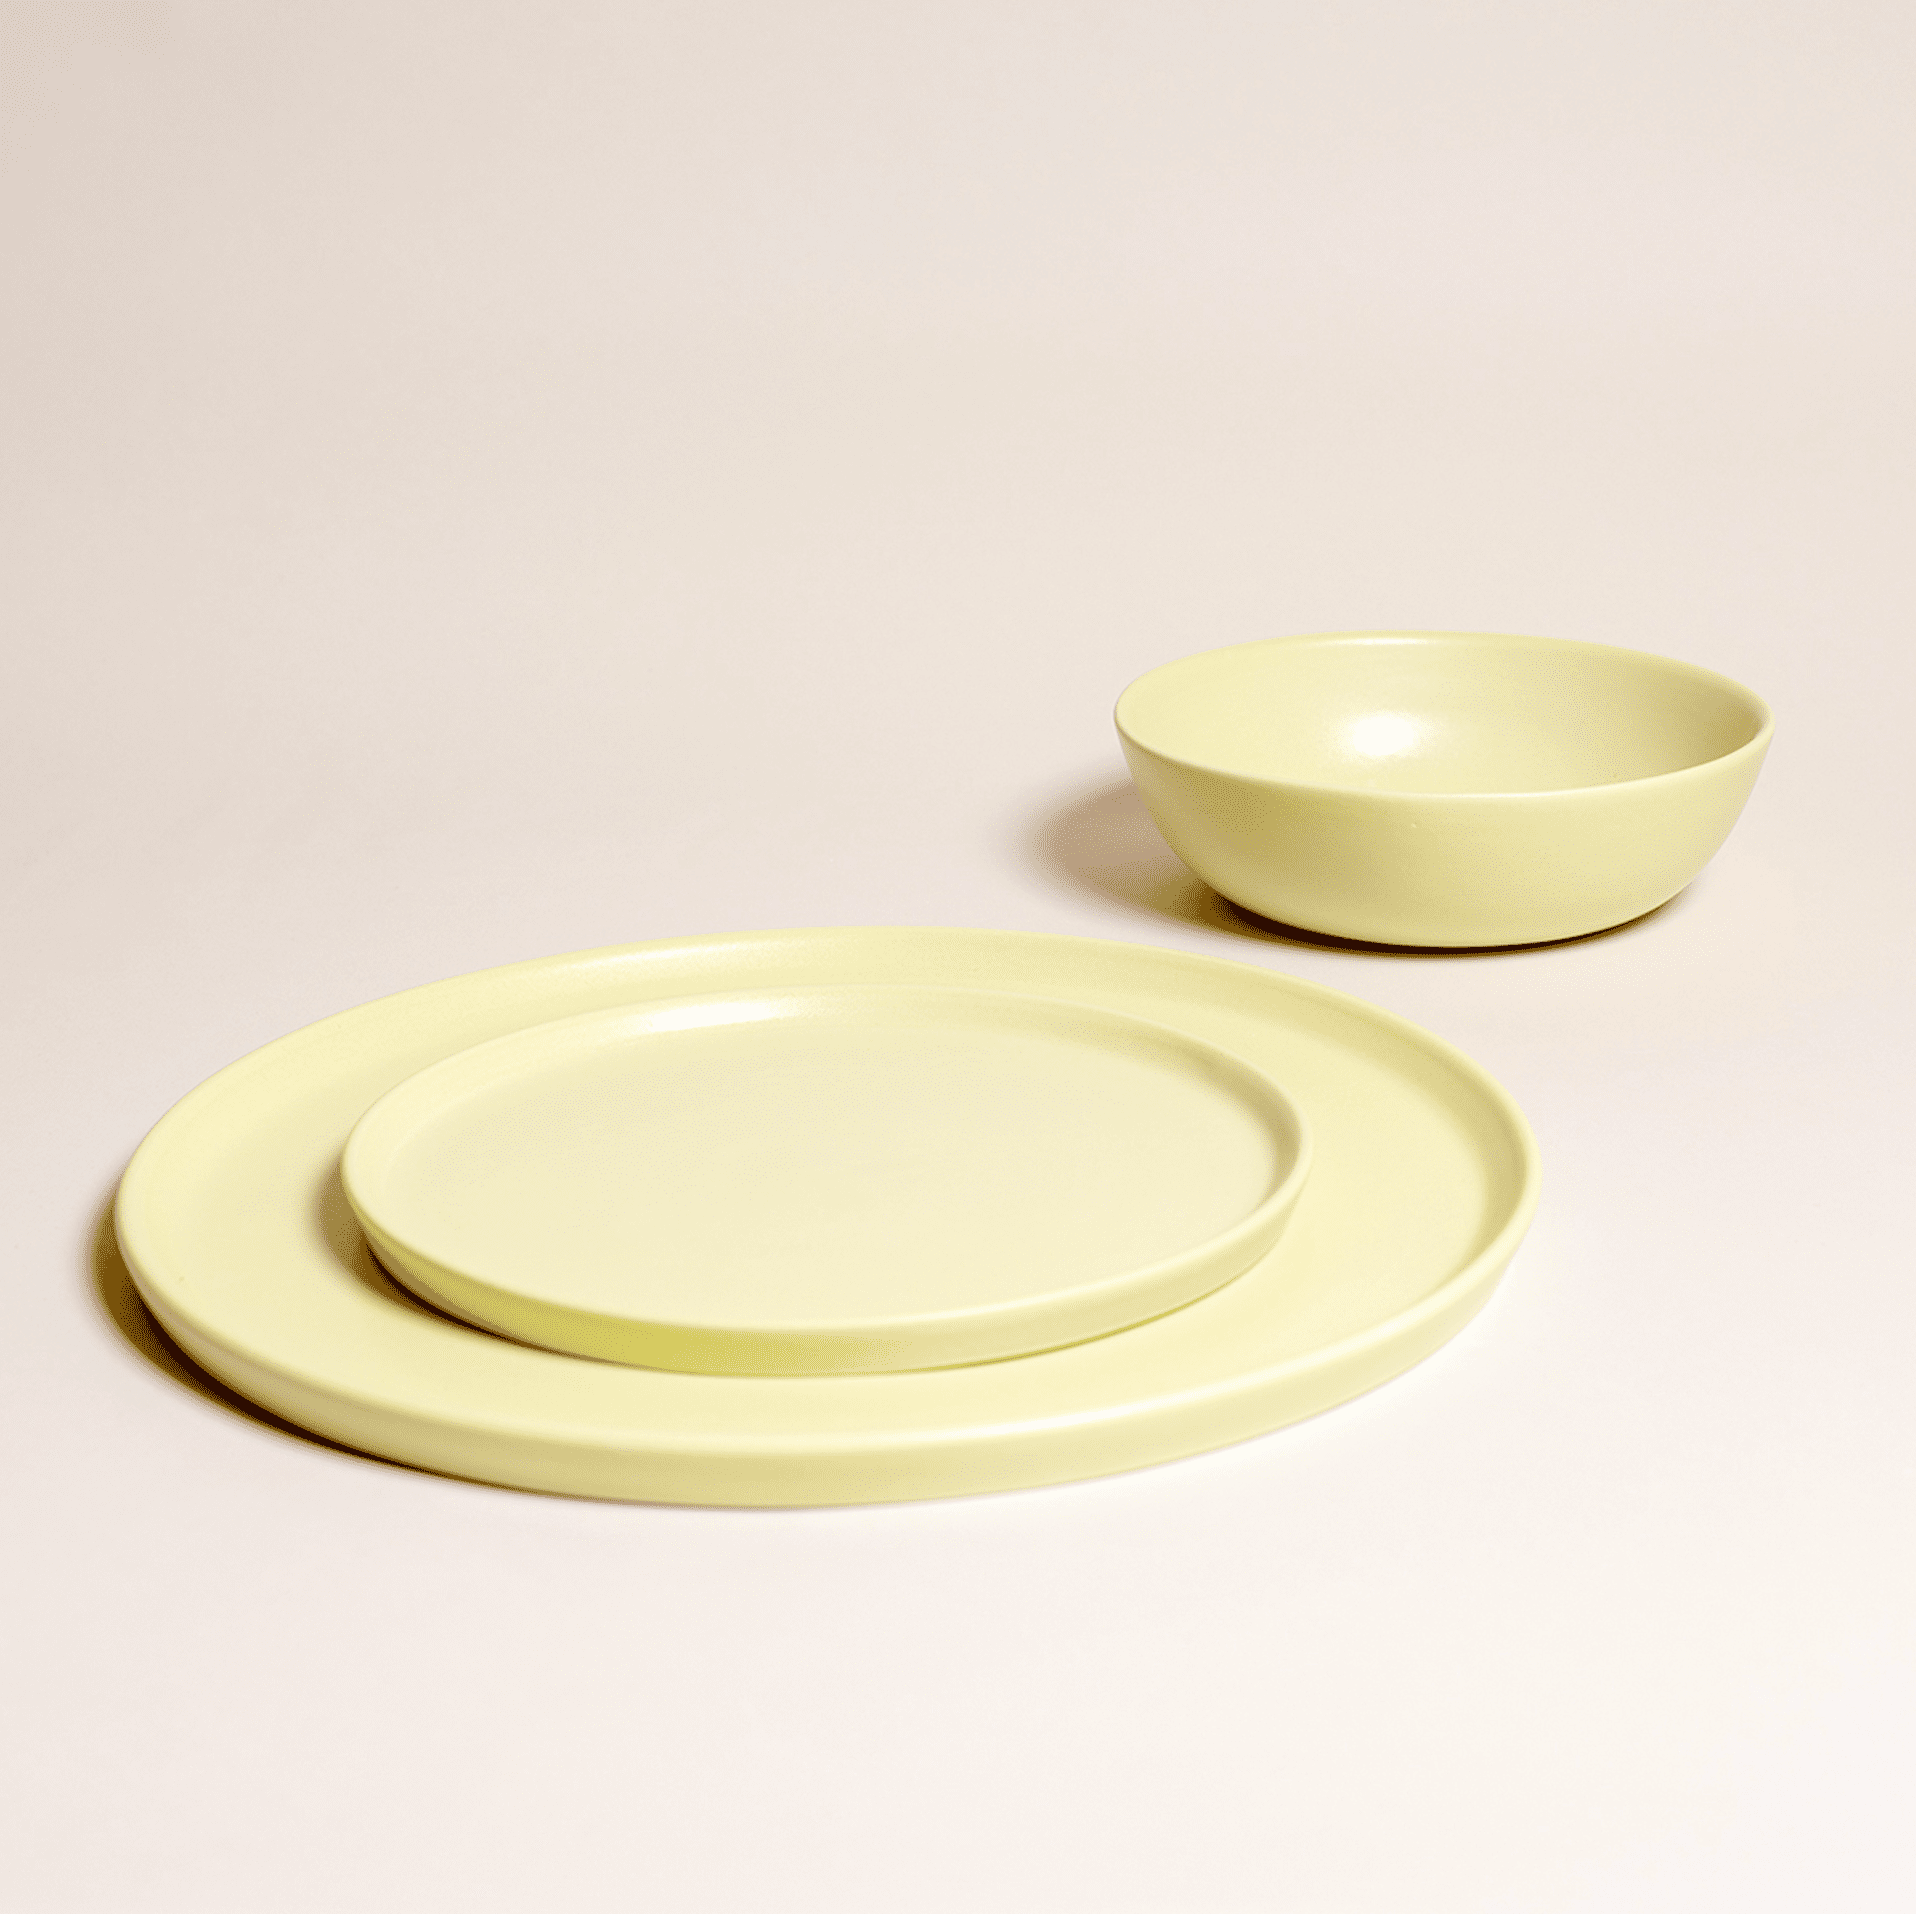 Felt+Fat Simple dining set